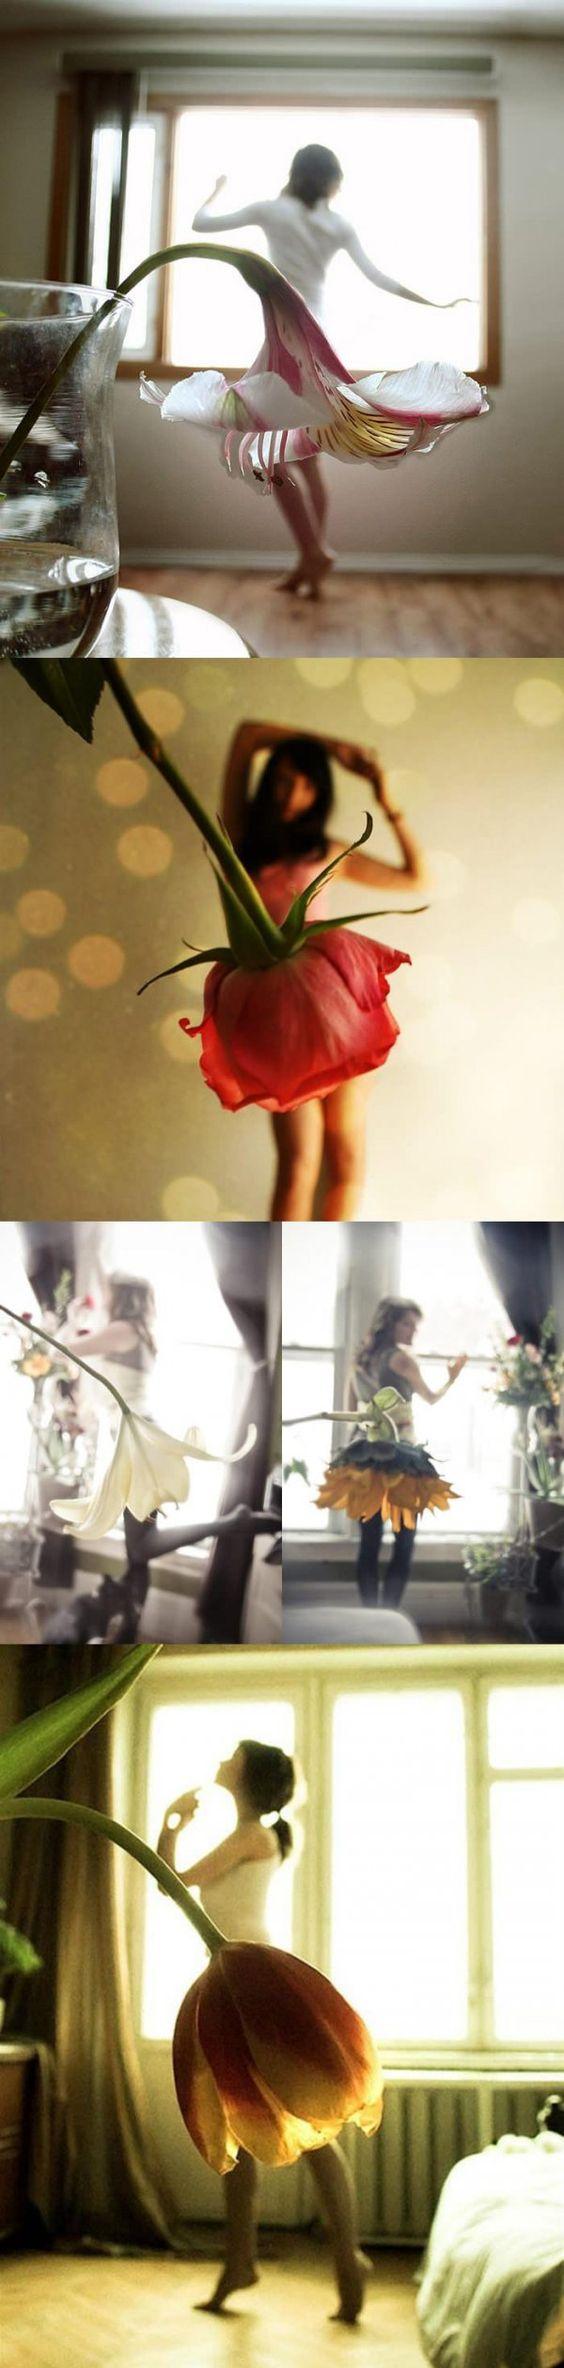 kreativnost-originalnye-fotografii